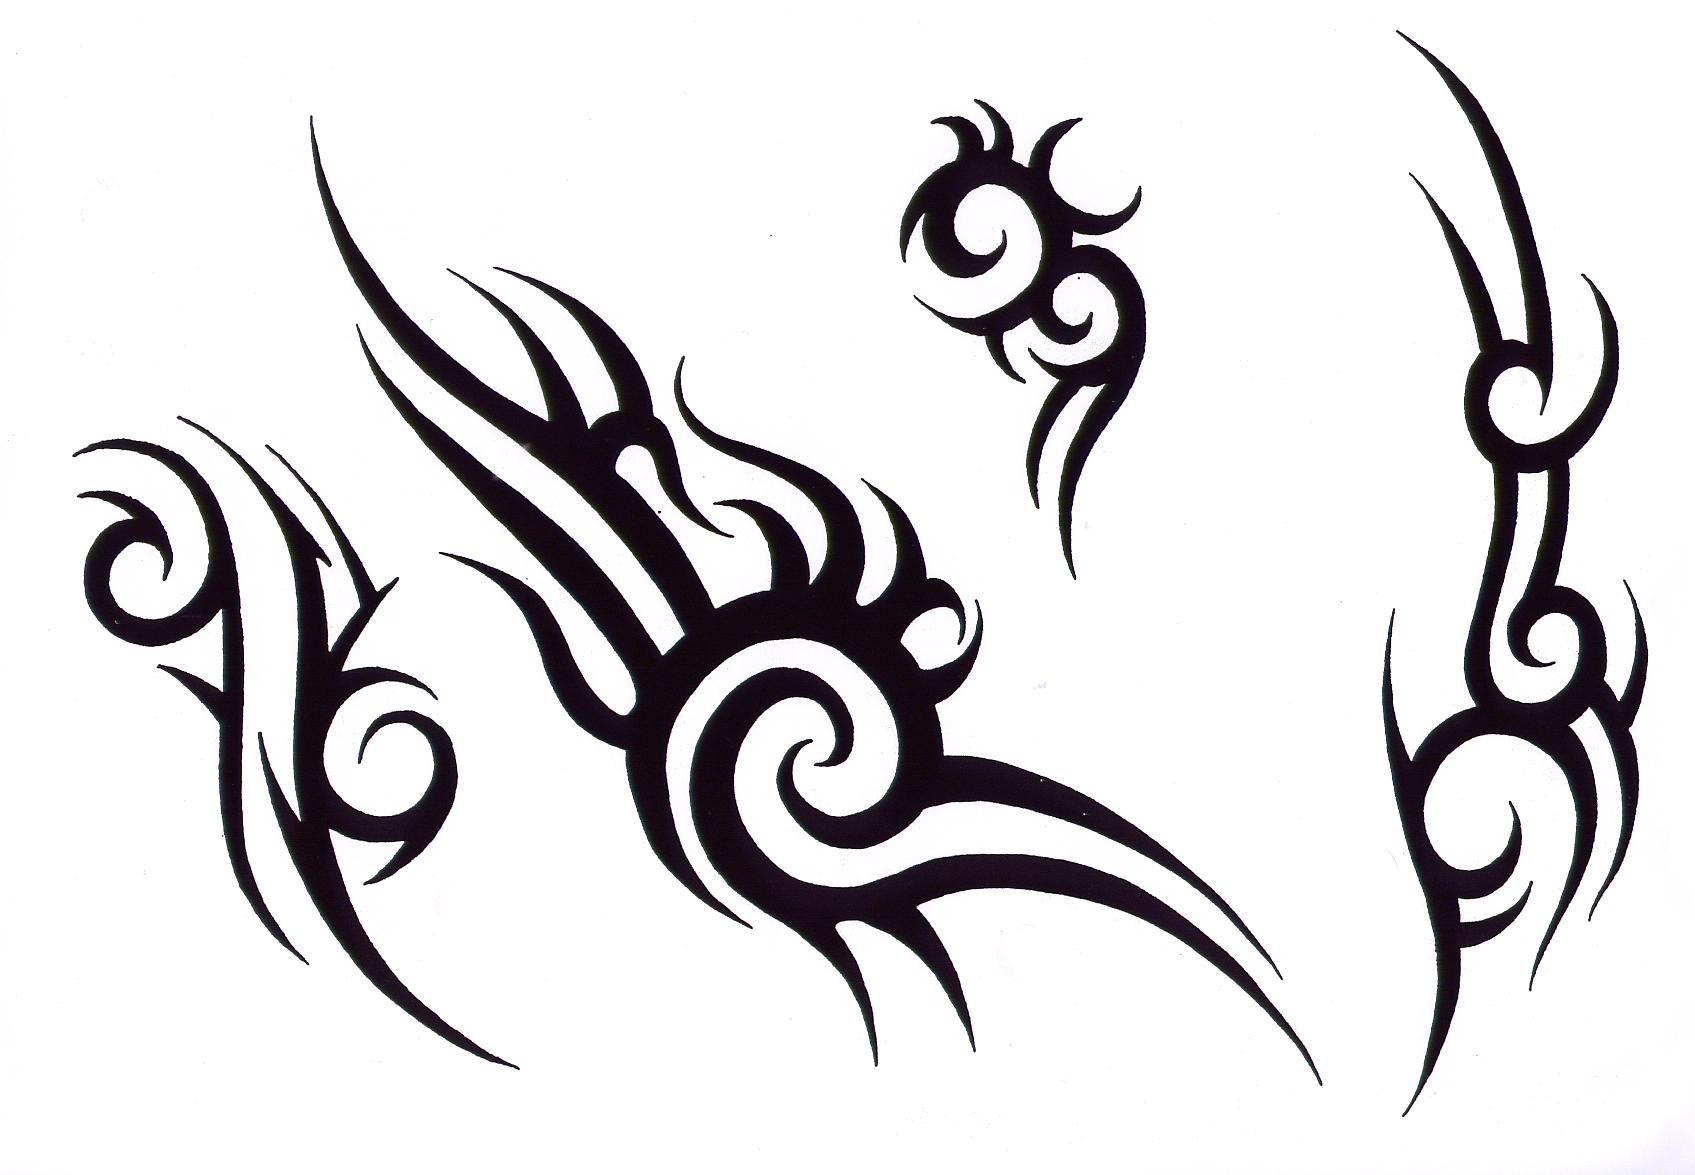 Henna Tattoo Design Tribal: Easy Tribal Tattoo Designs For Men 2014